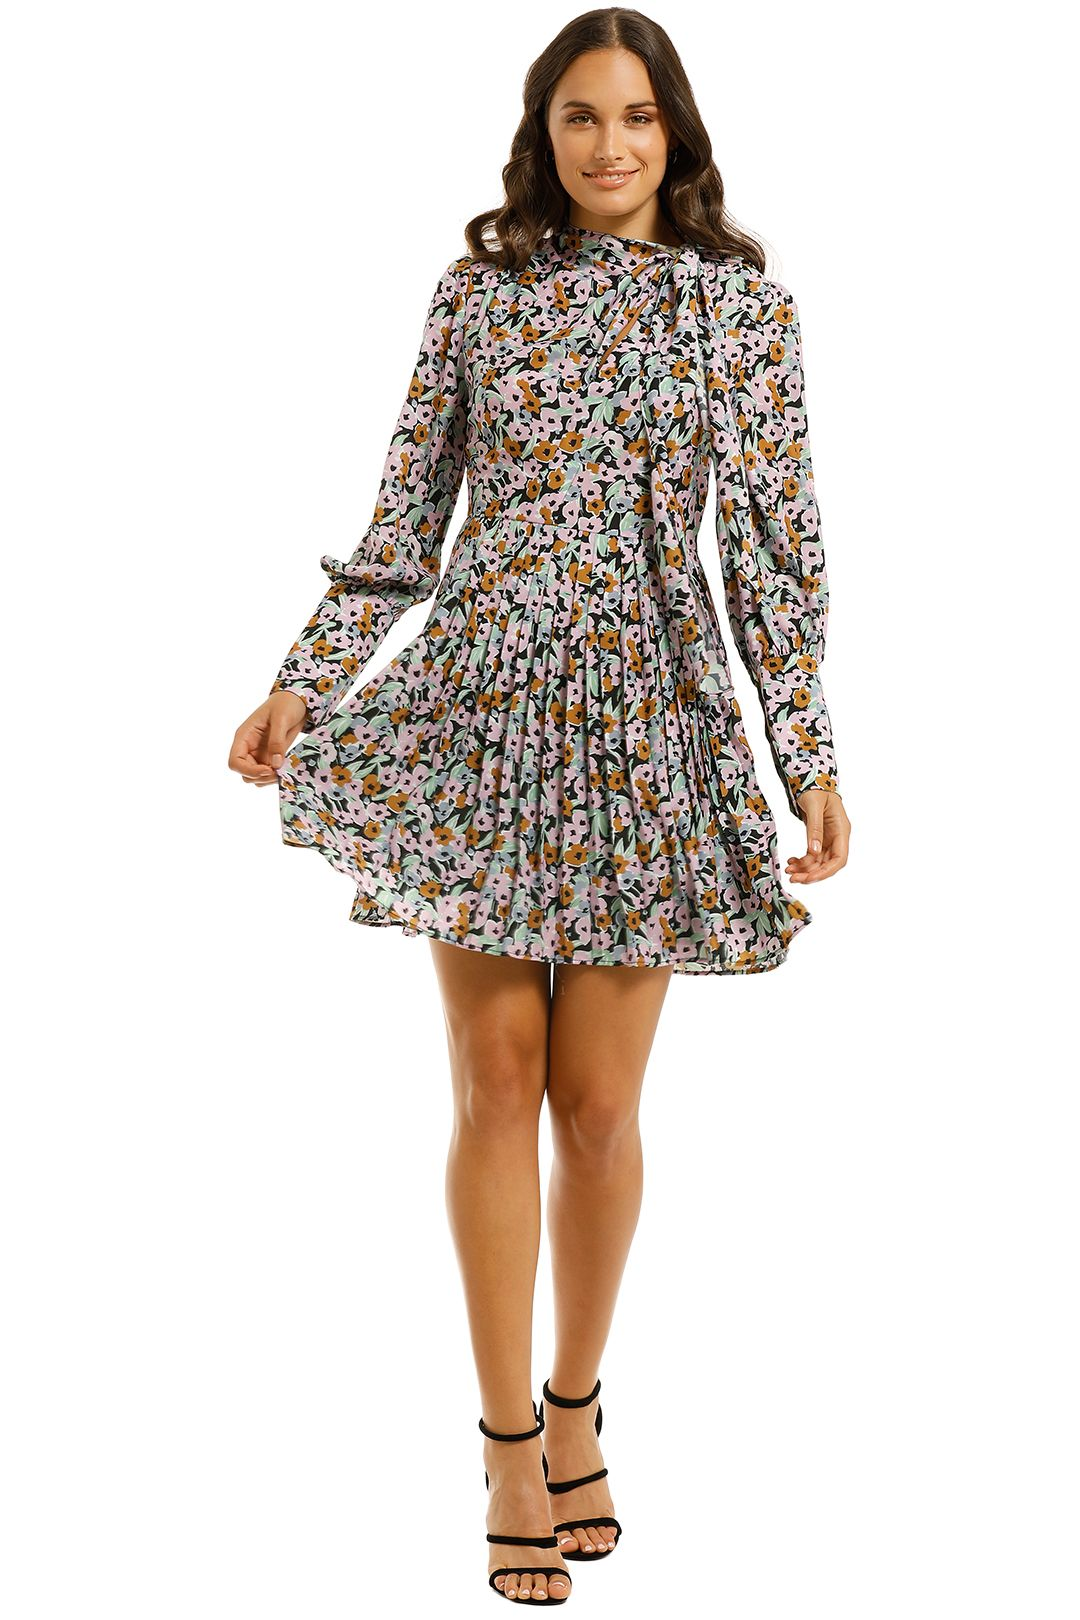 Grace-Willow-Alexis-Dress-Floral-Multi-Front